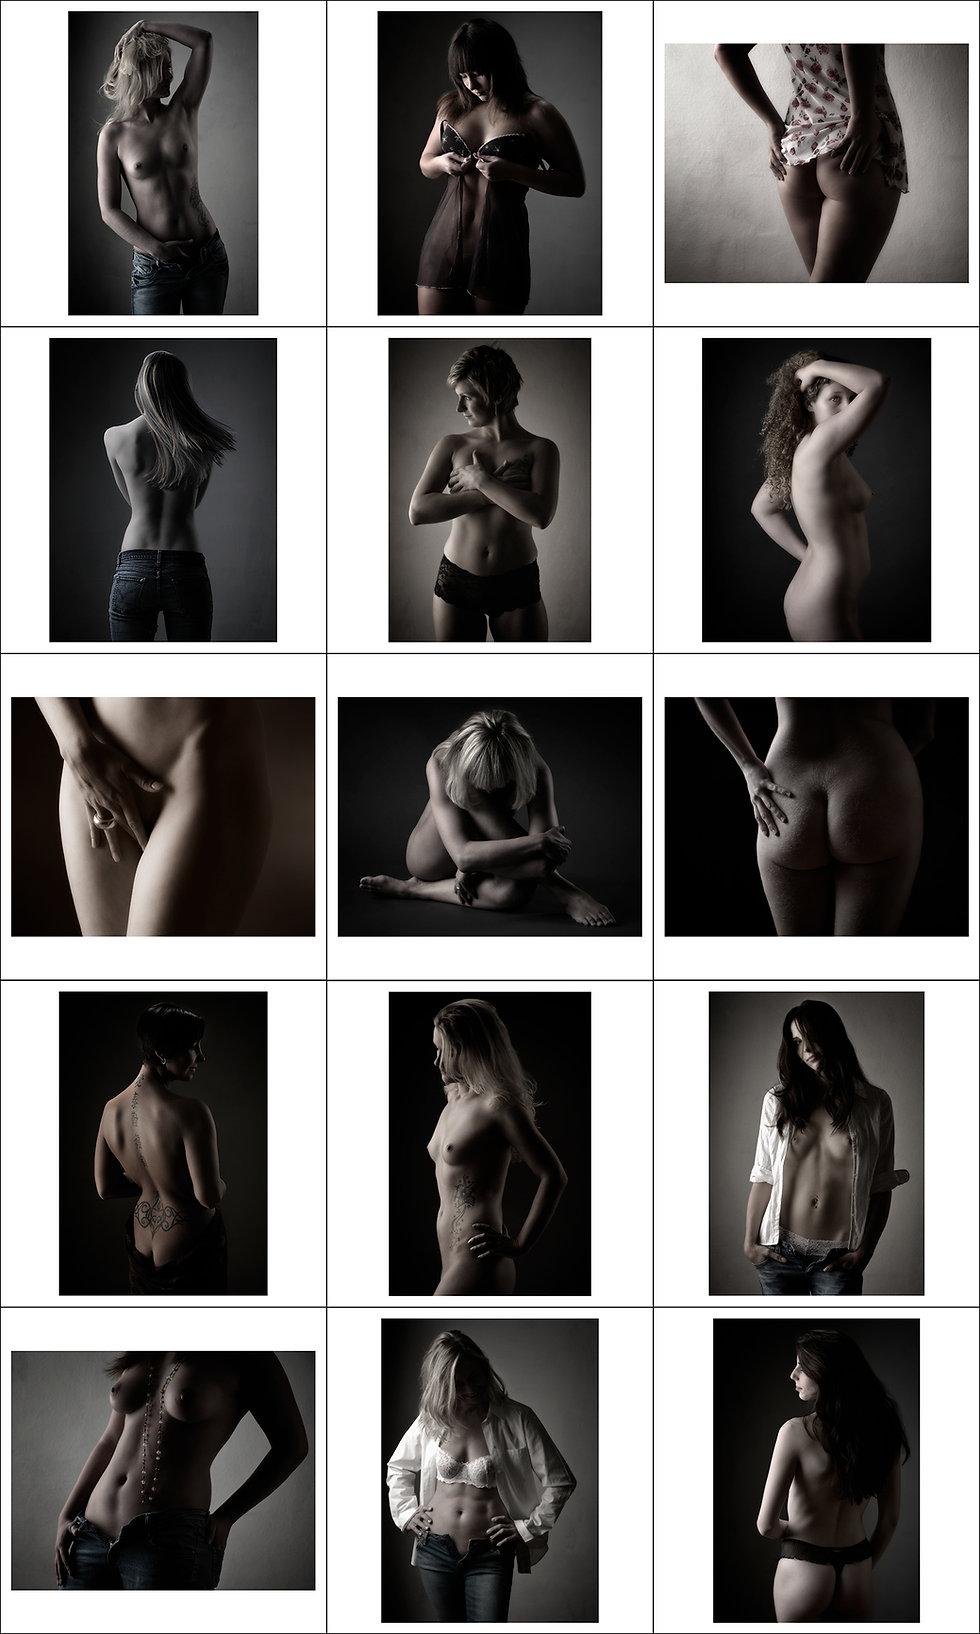 Creative People, Akt, Dessous, black & white, International Photographic Qualifications, International Photographer of High Performance